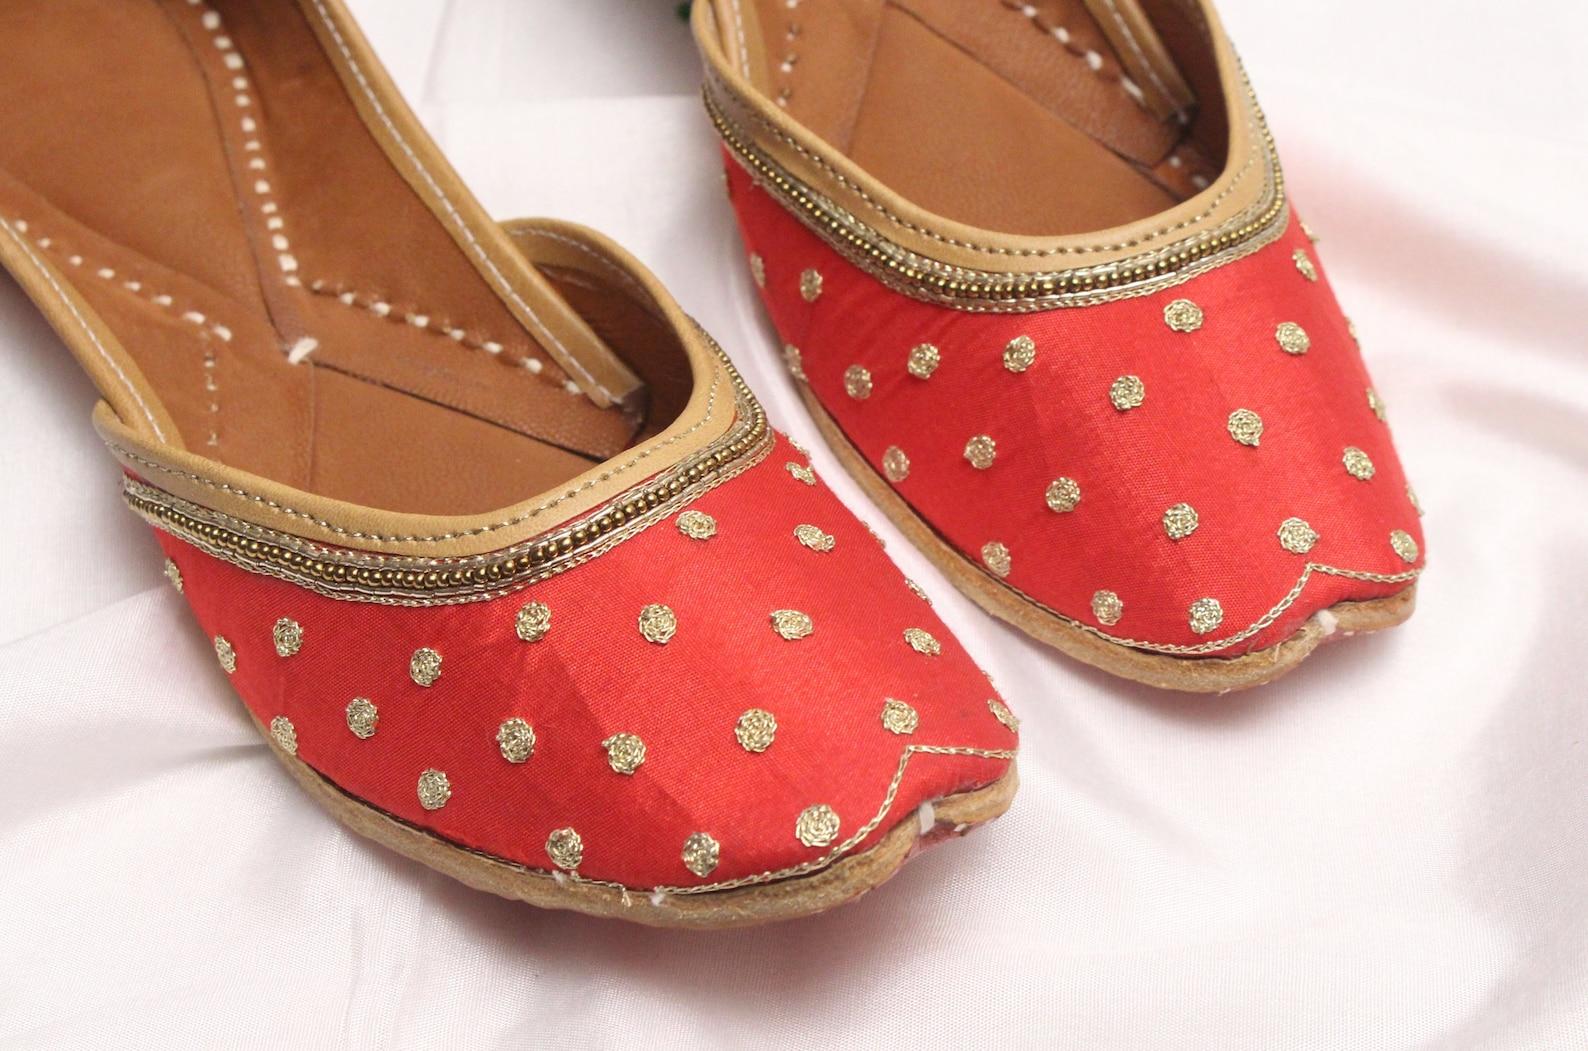 red gold shoes bridal wedding/women maroon red gold jutti shoes/indian wedding flats/ballet flats/khussa shoes/punjabi shoe us s